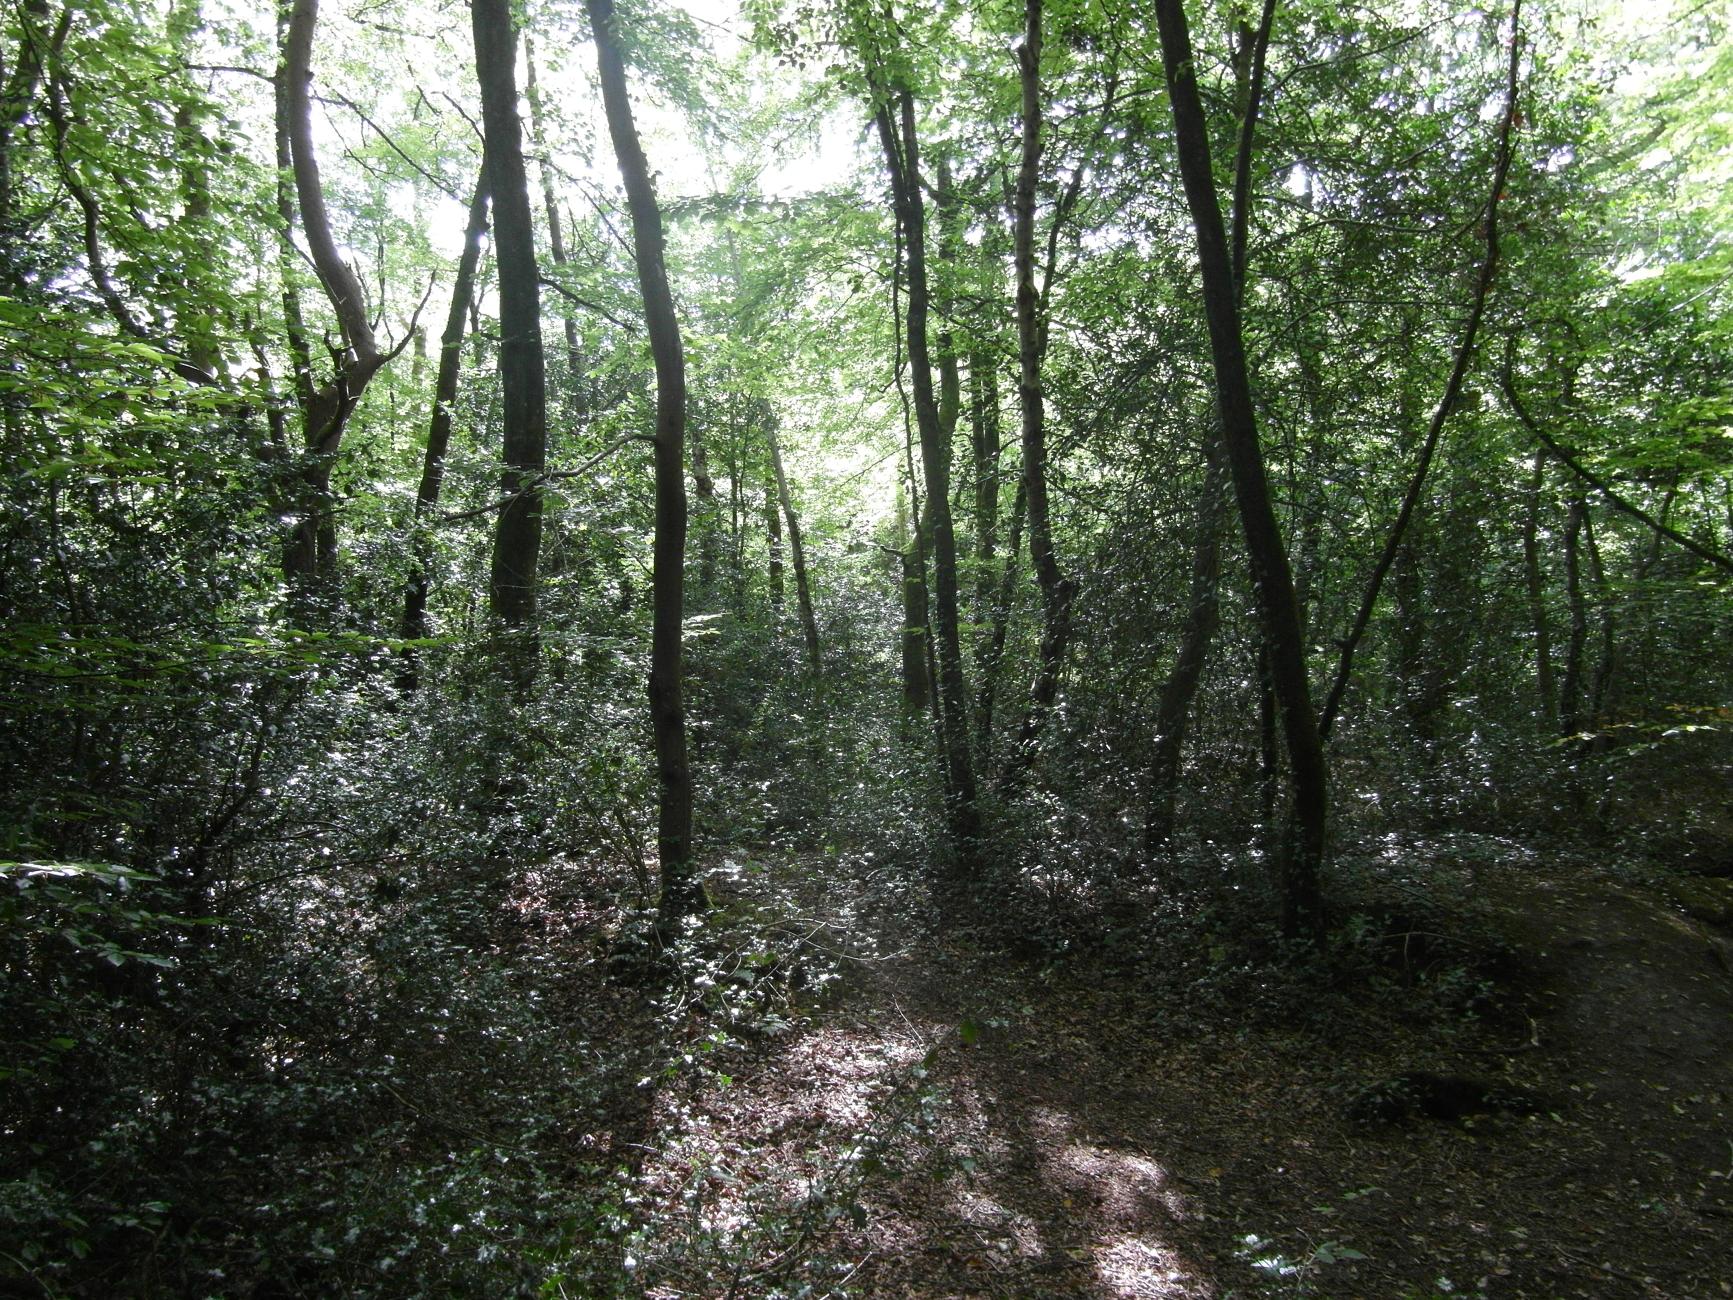 Trees at Decoy